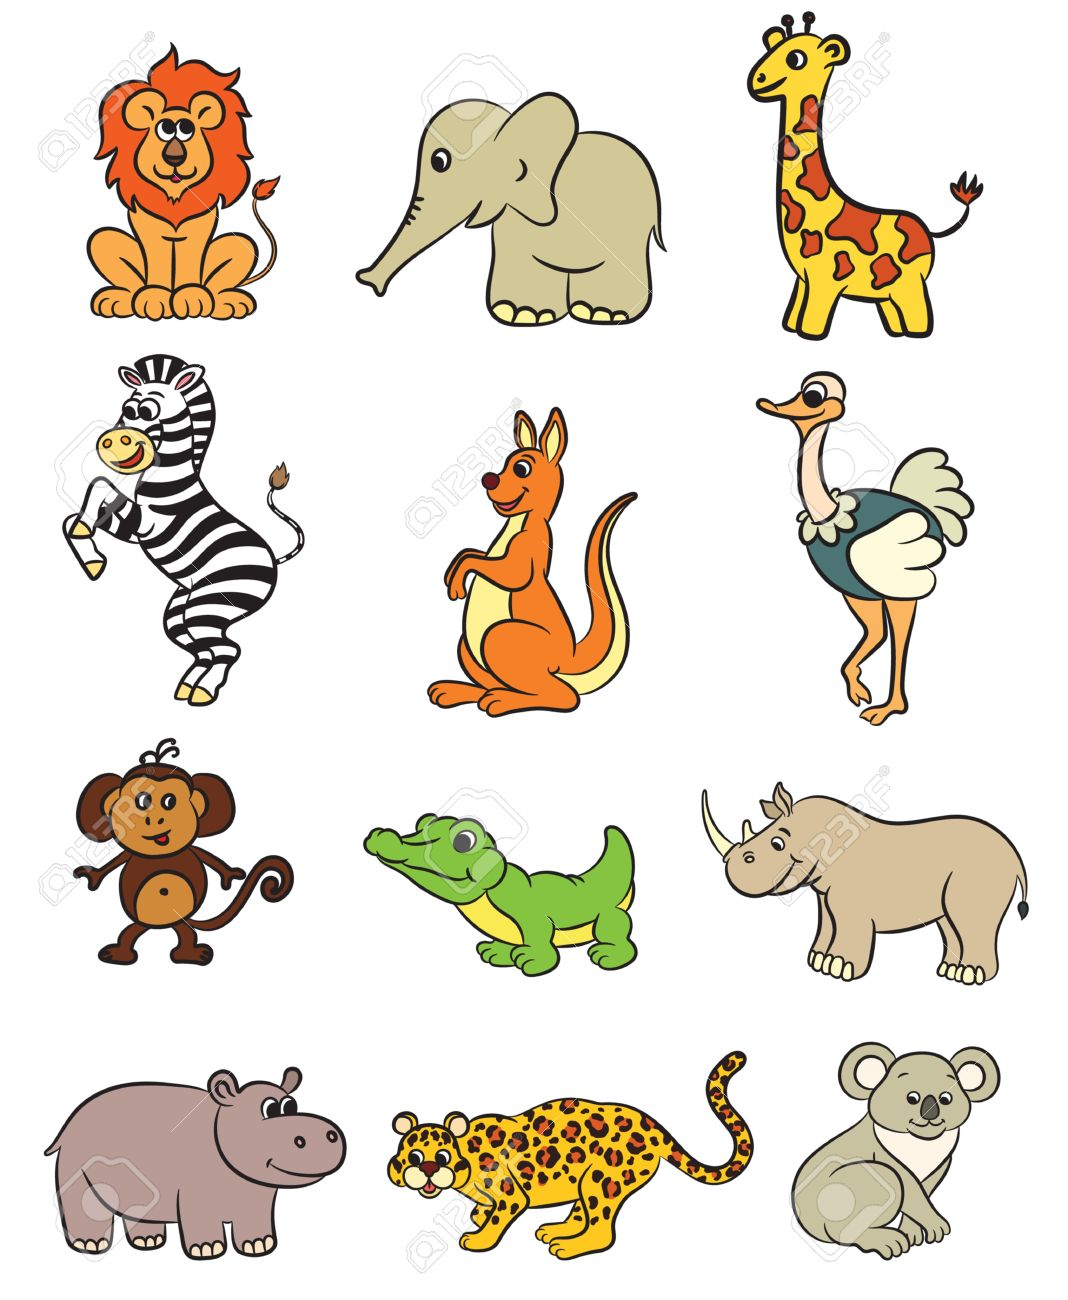 412 Cartoon Emu Stock Vector Illustration And Royalty Free Cartoon ...